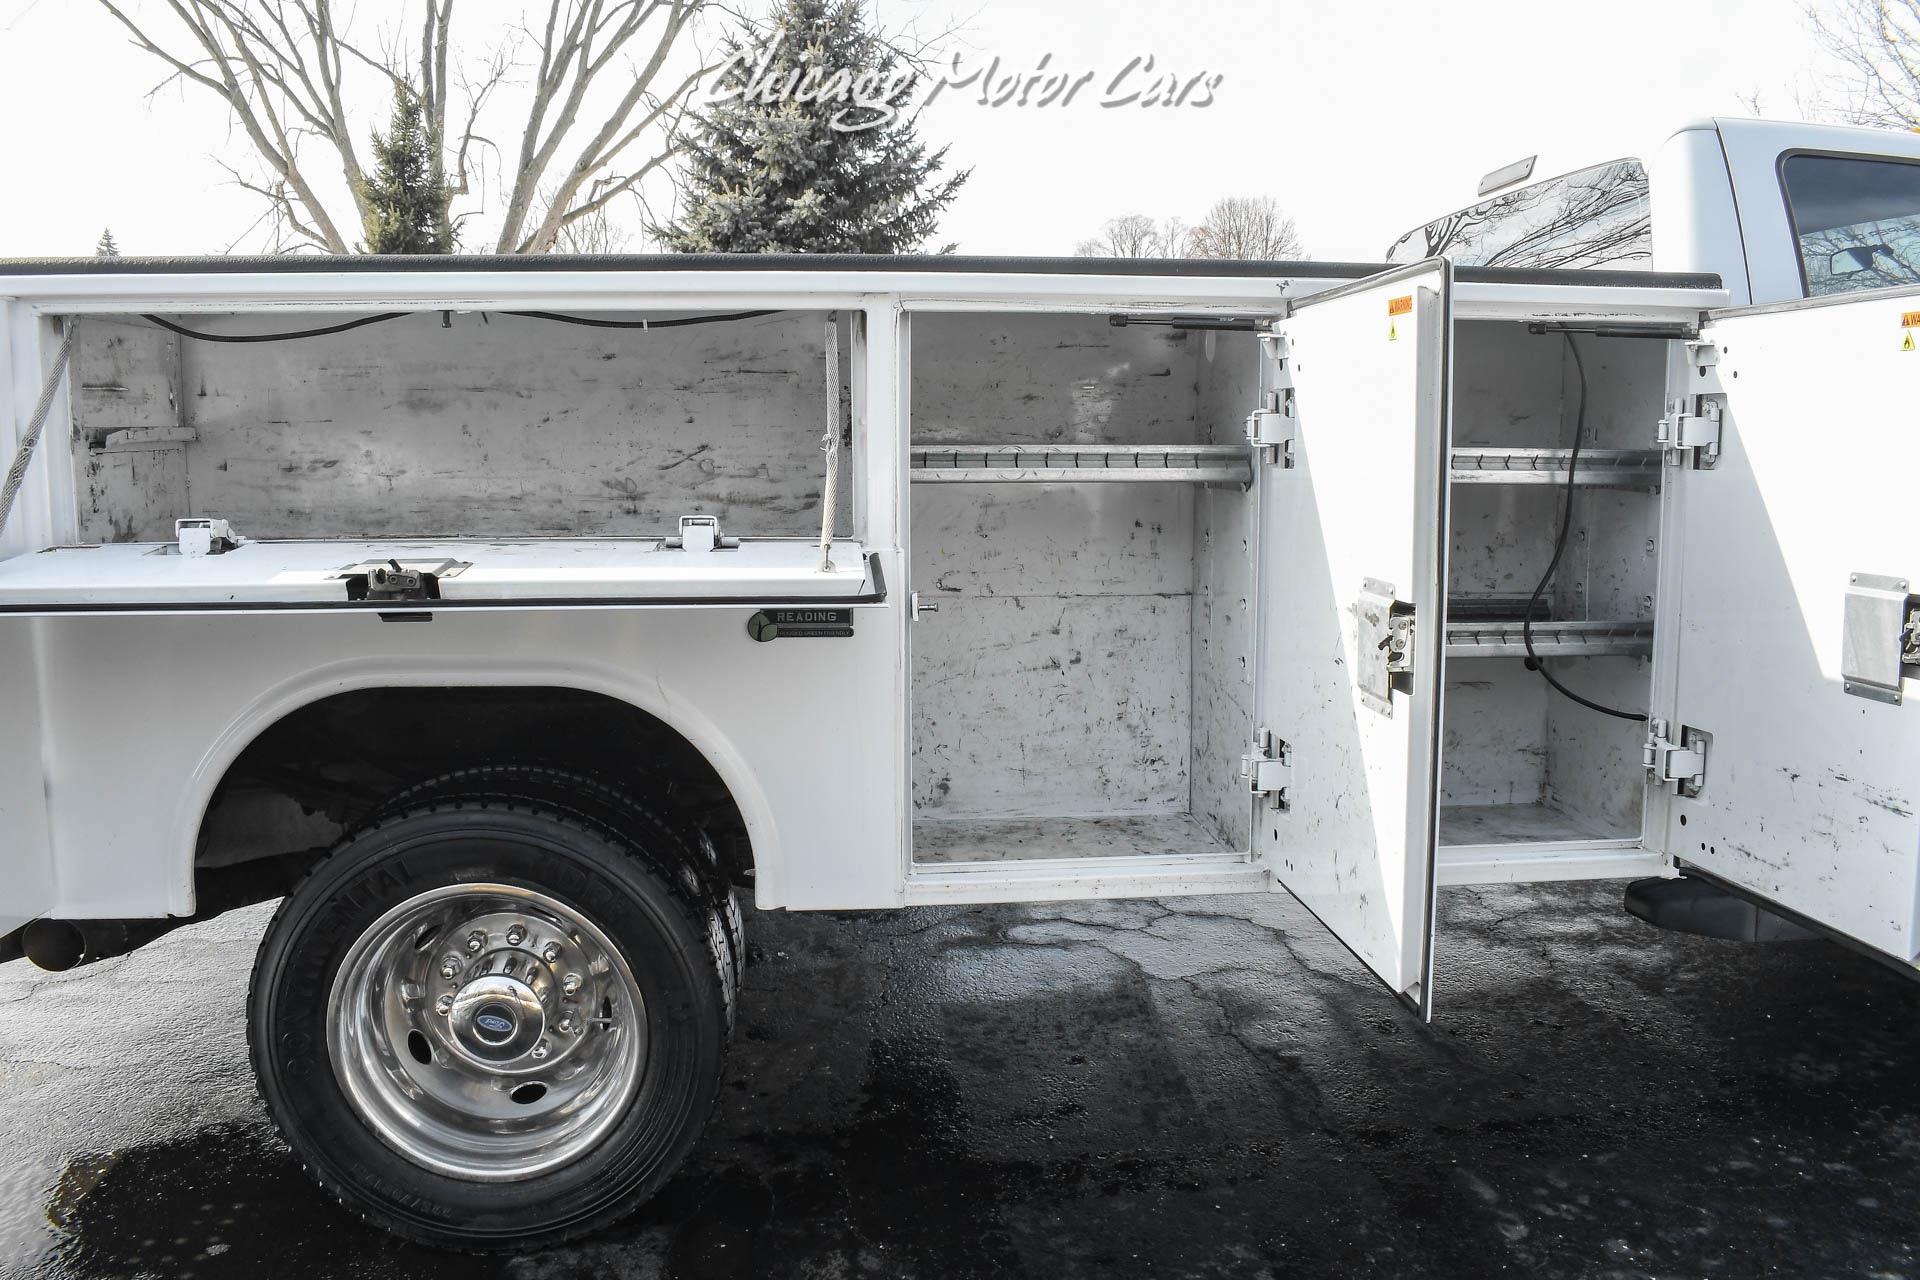 Used-2016-Ford-F450-67-PowerStroke-Diesel-4x4-Service-Truck